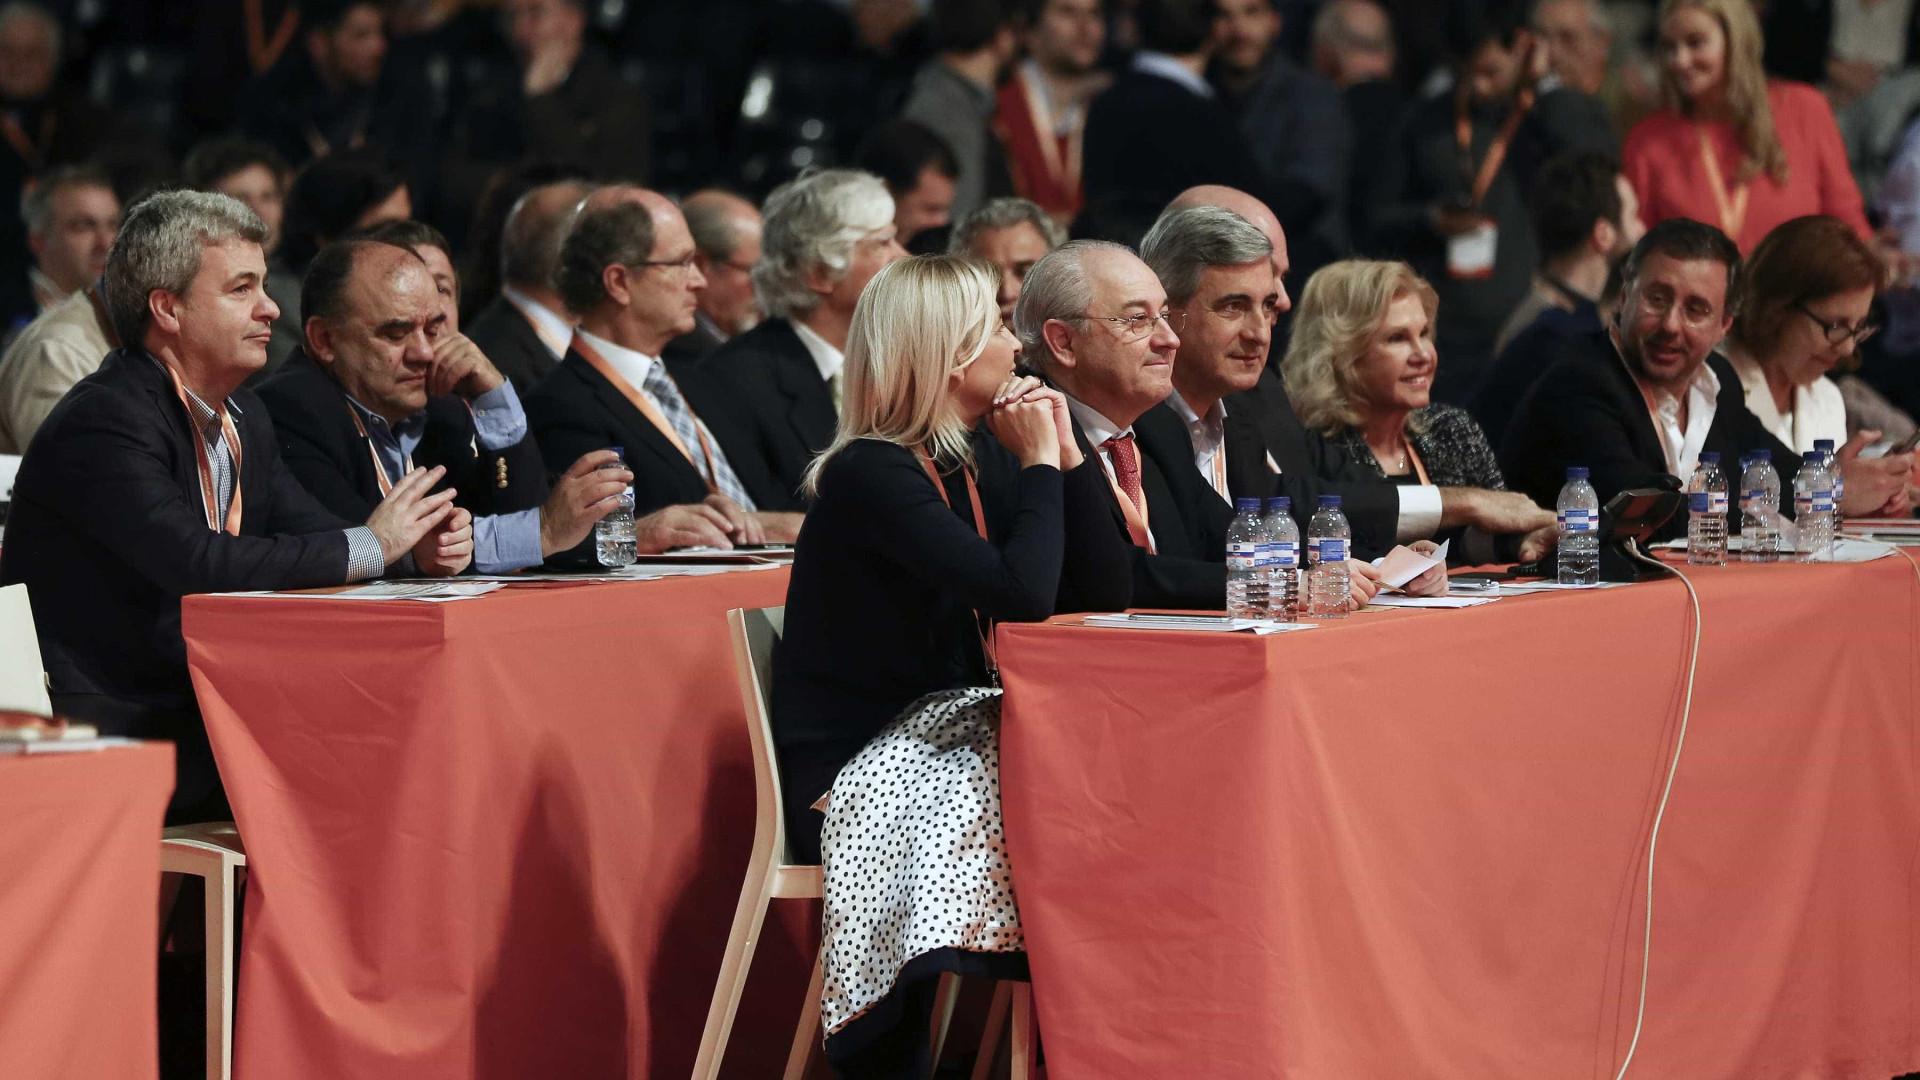 Mesa do Congresso do PSD recebeu oito listas ao Conselho Nacional